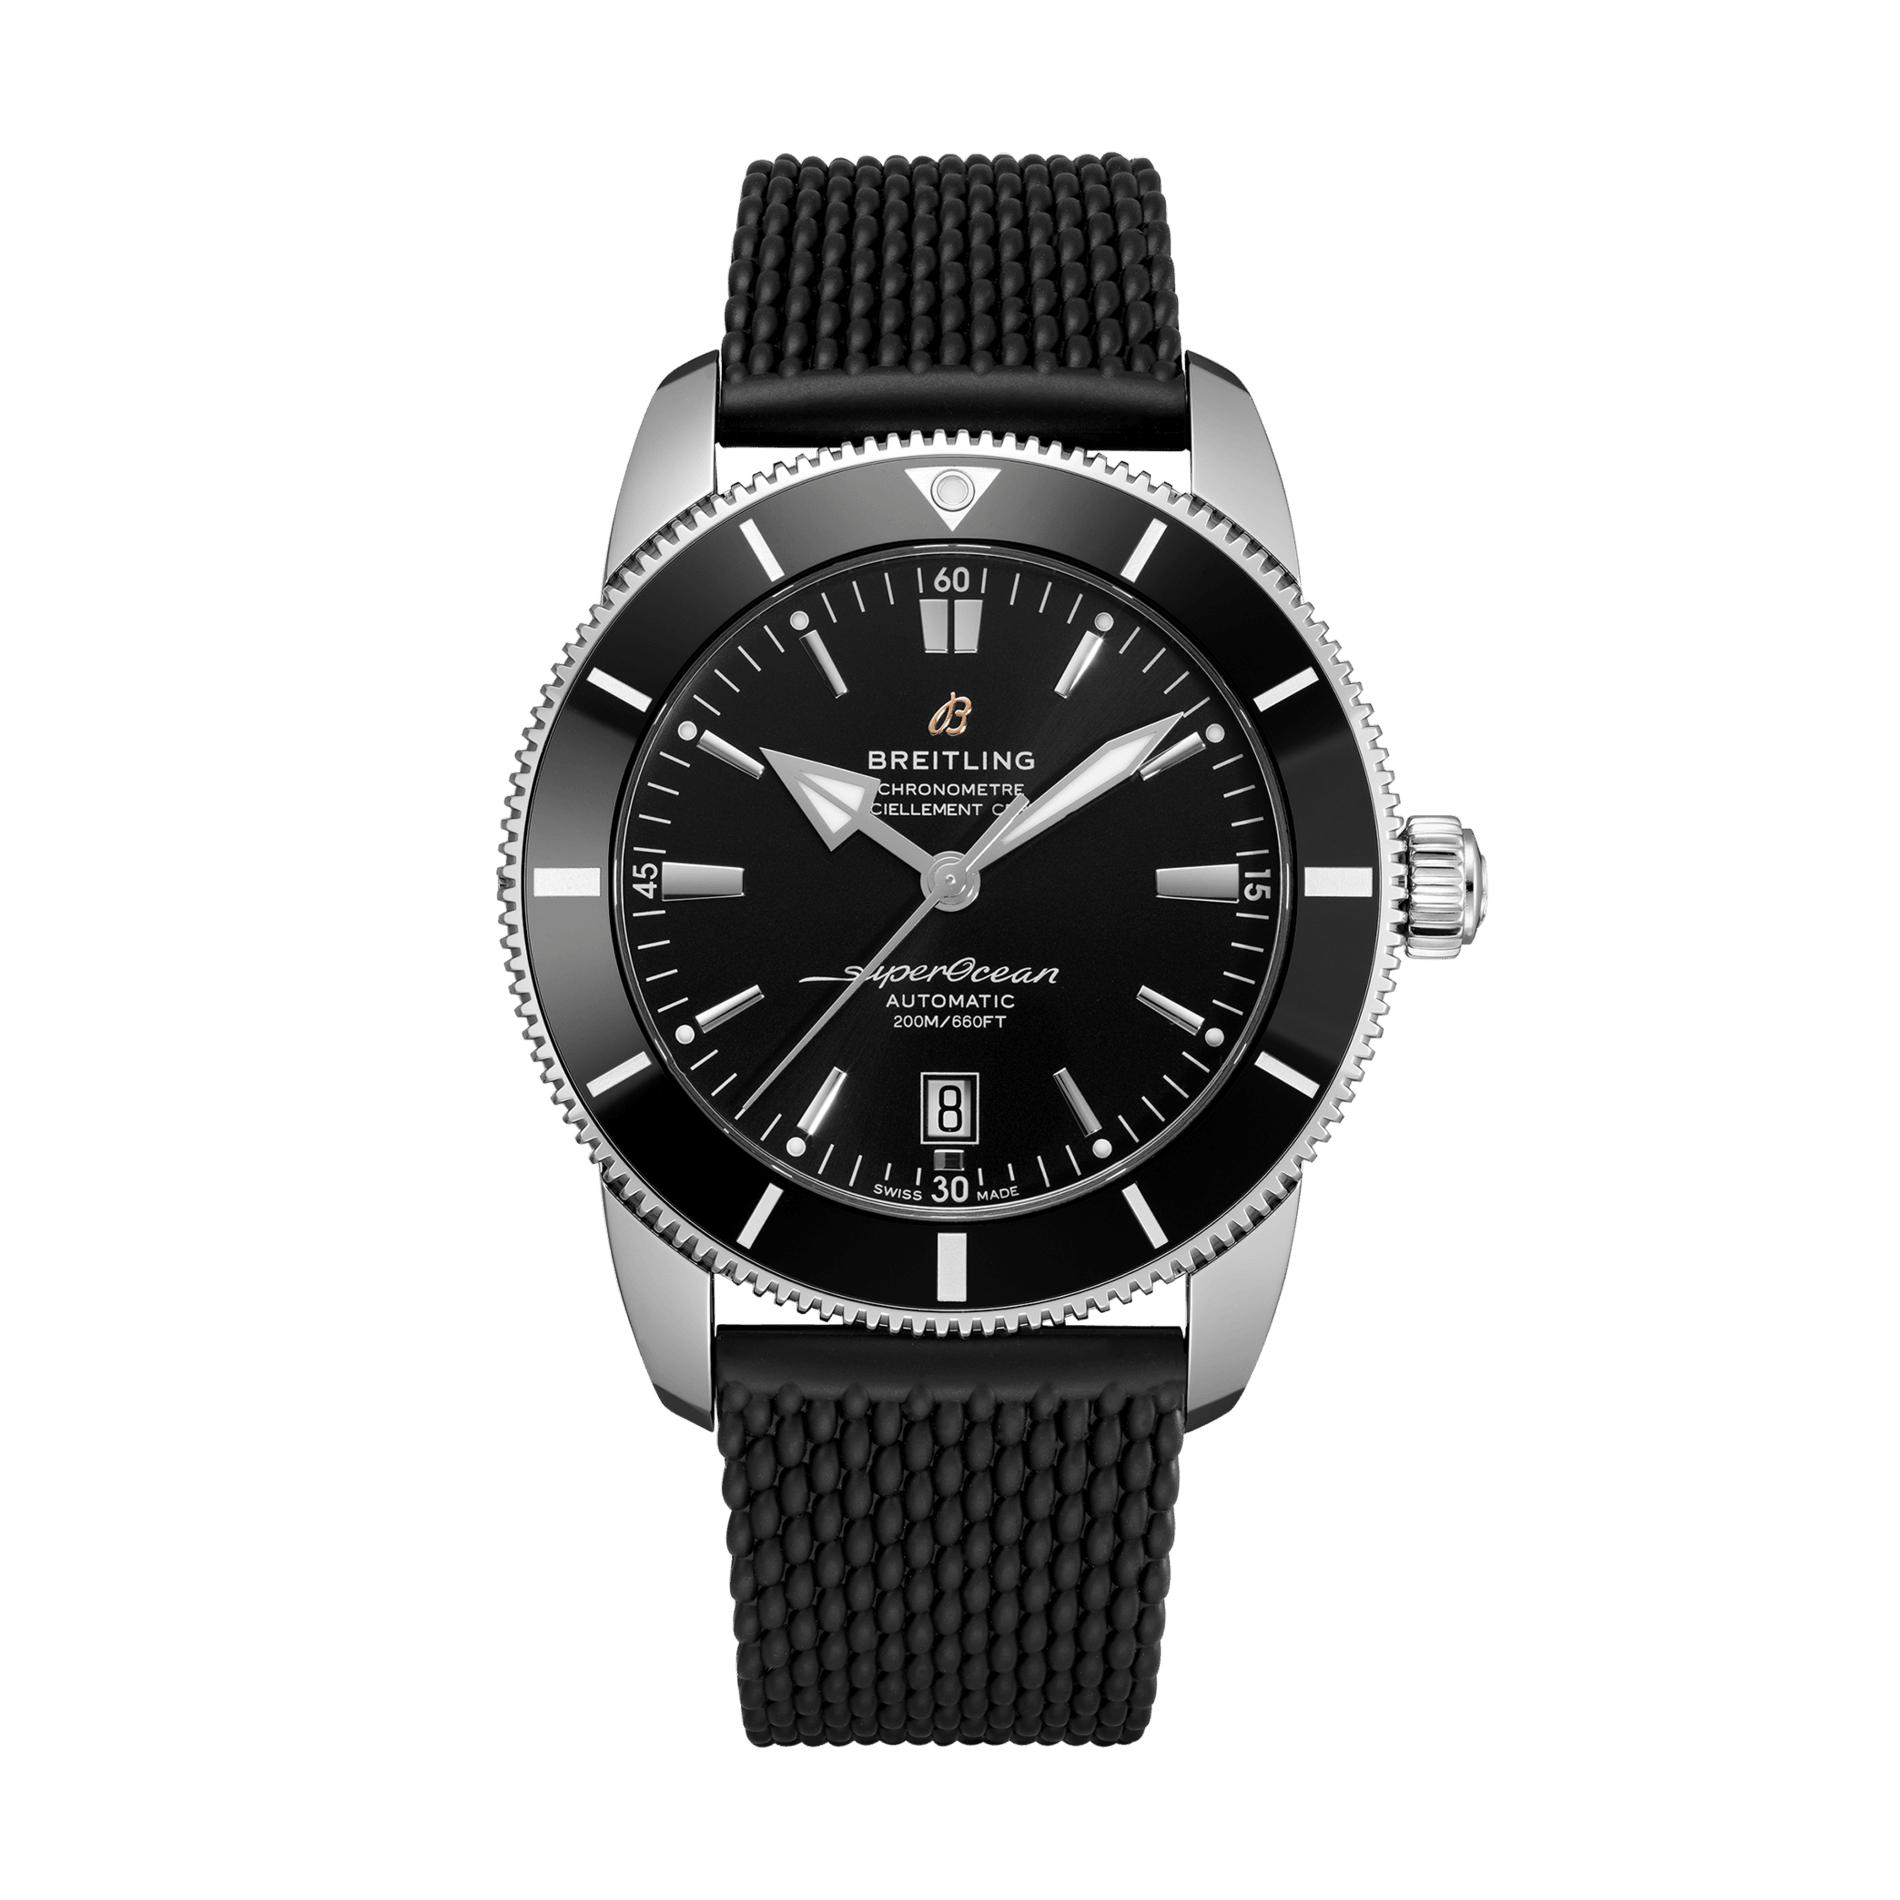 Reloj Breitling – Superocean Heritage B20 Automatic 46 Caucho - Amaya Joyeros